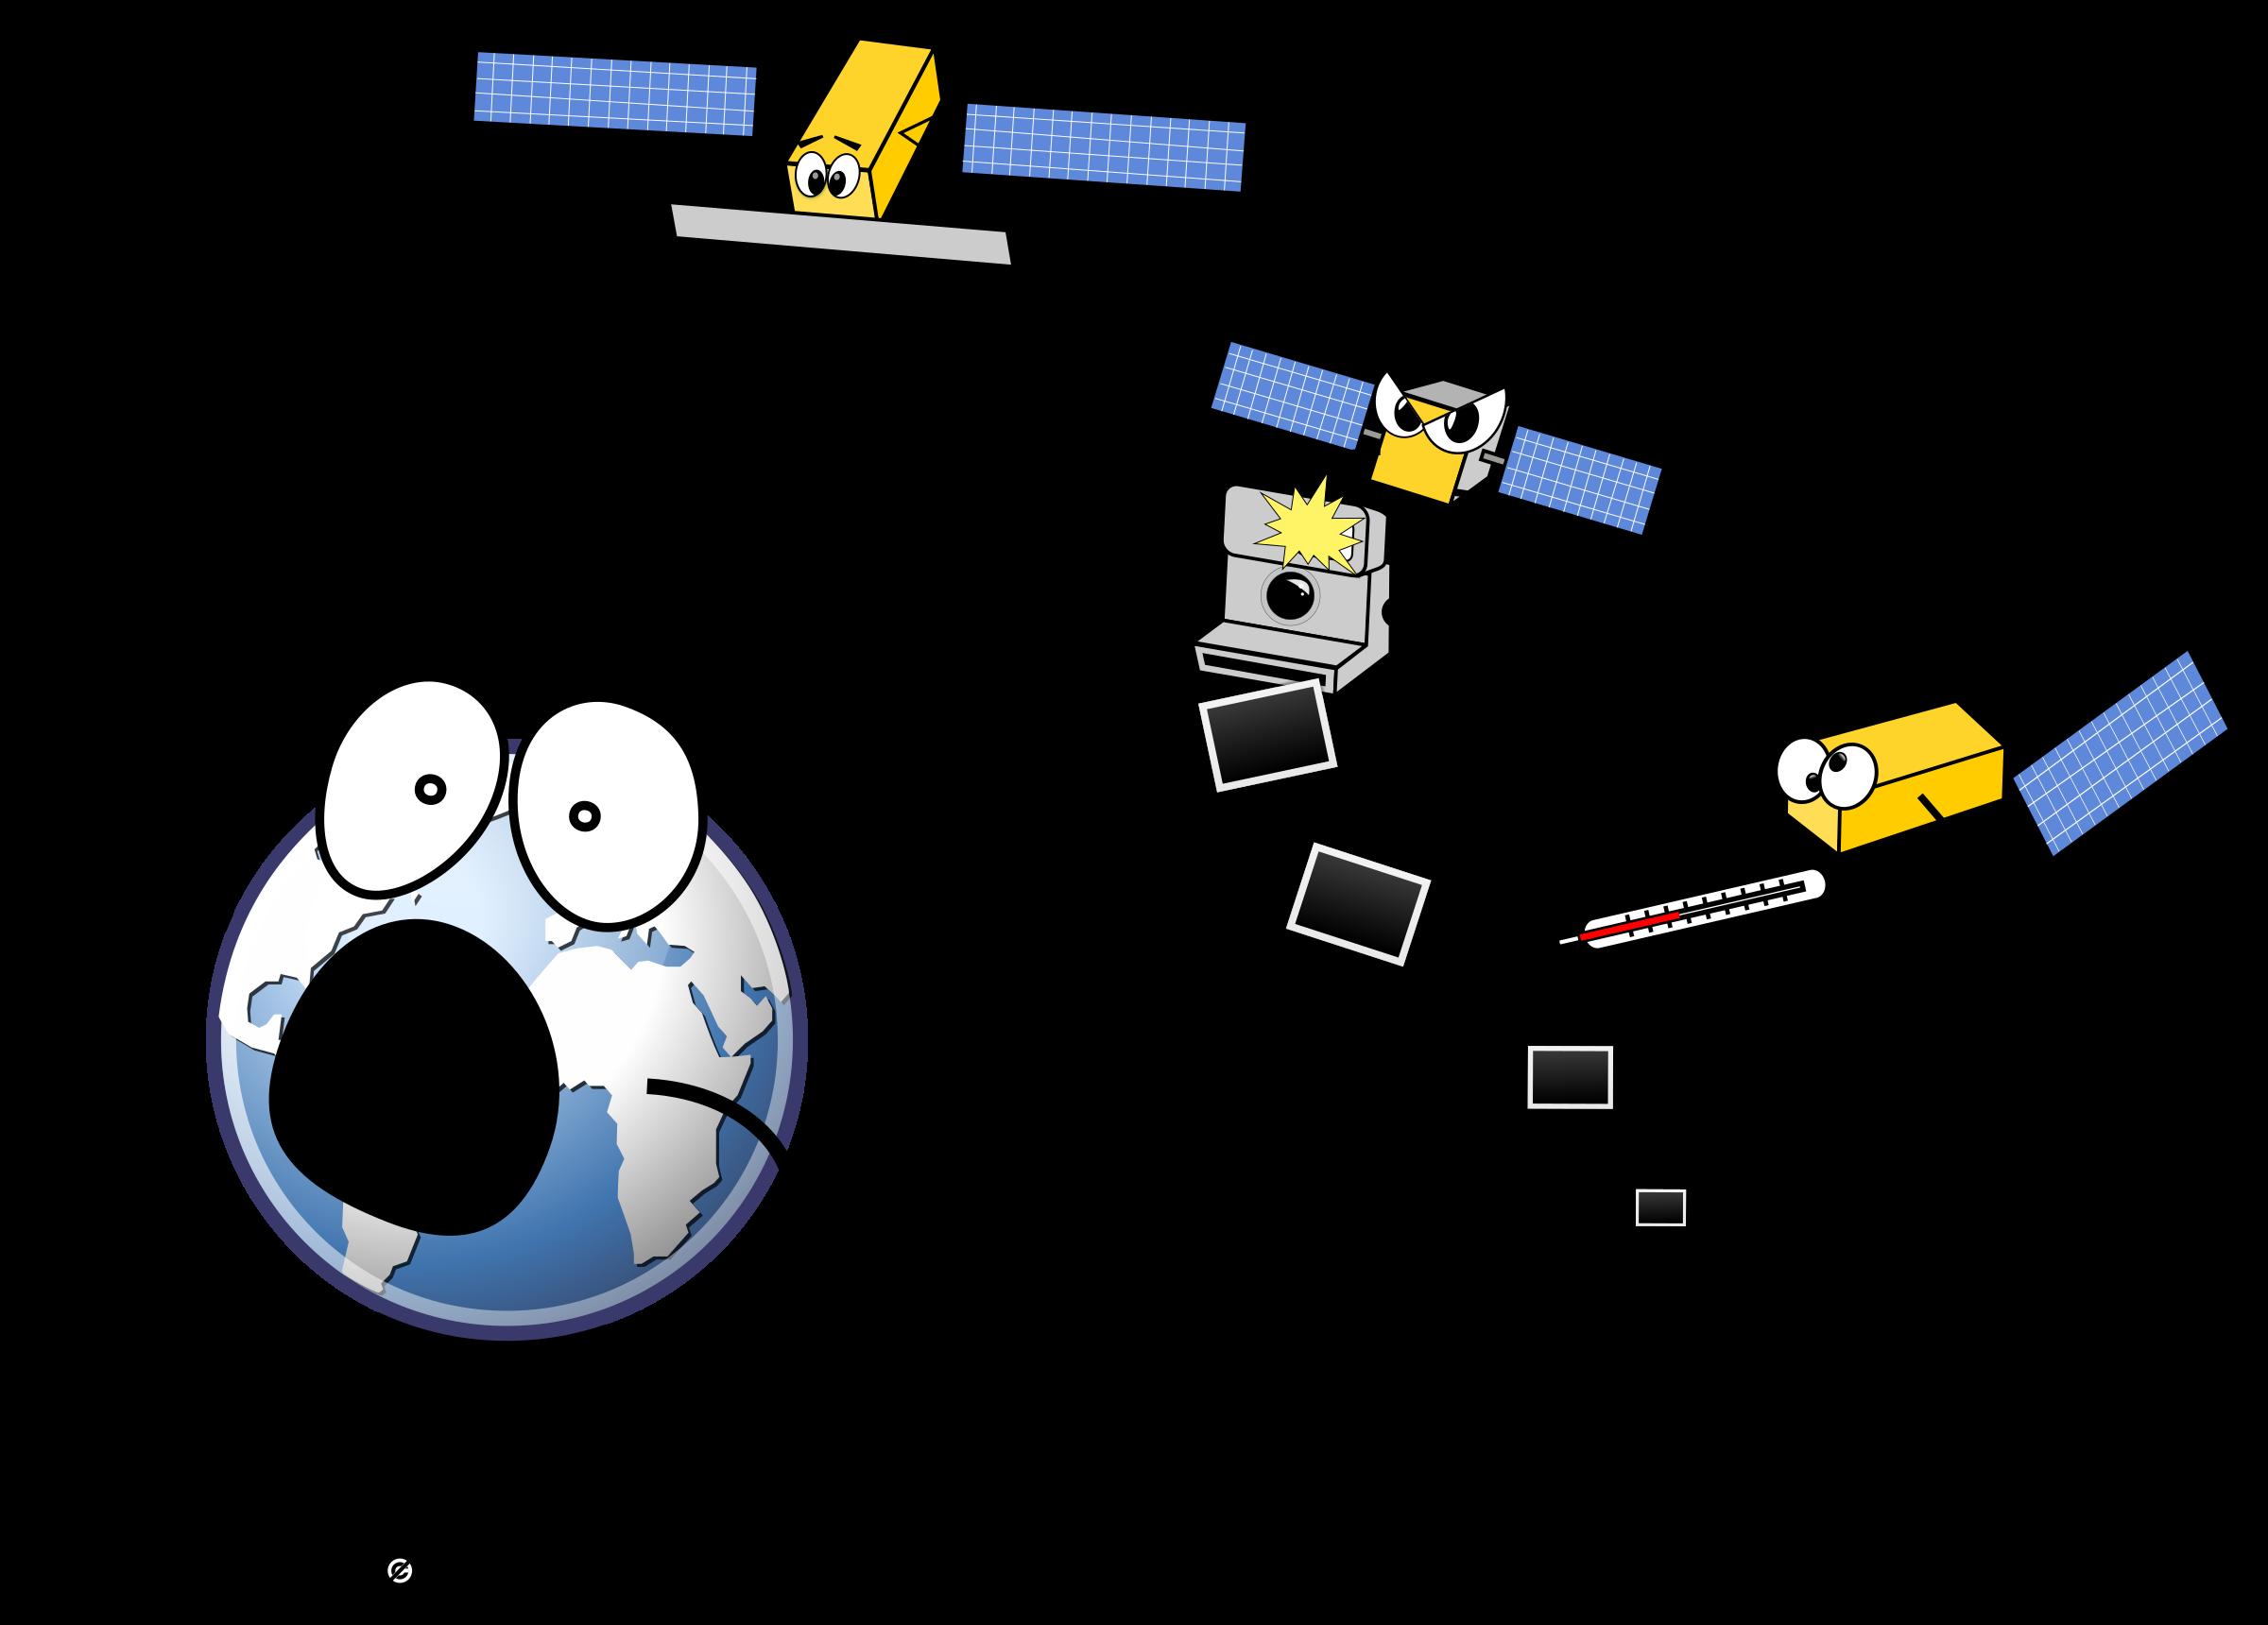 Gps clipart cartoon. Sentinel satellites parody icons